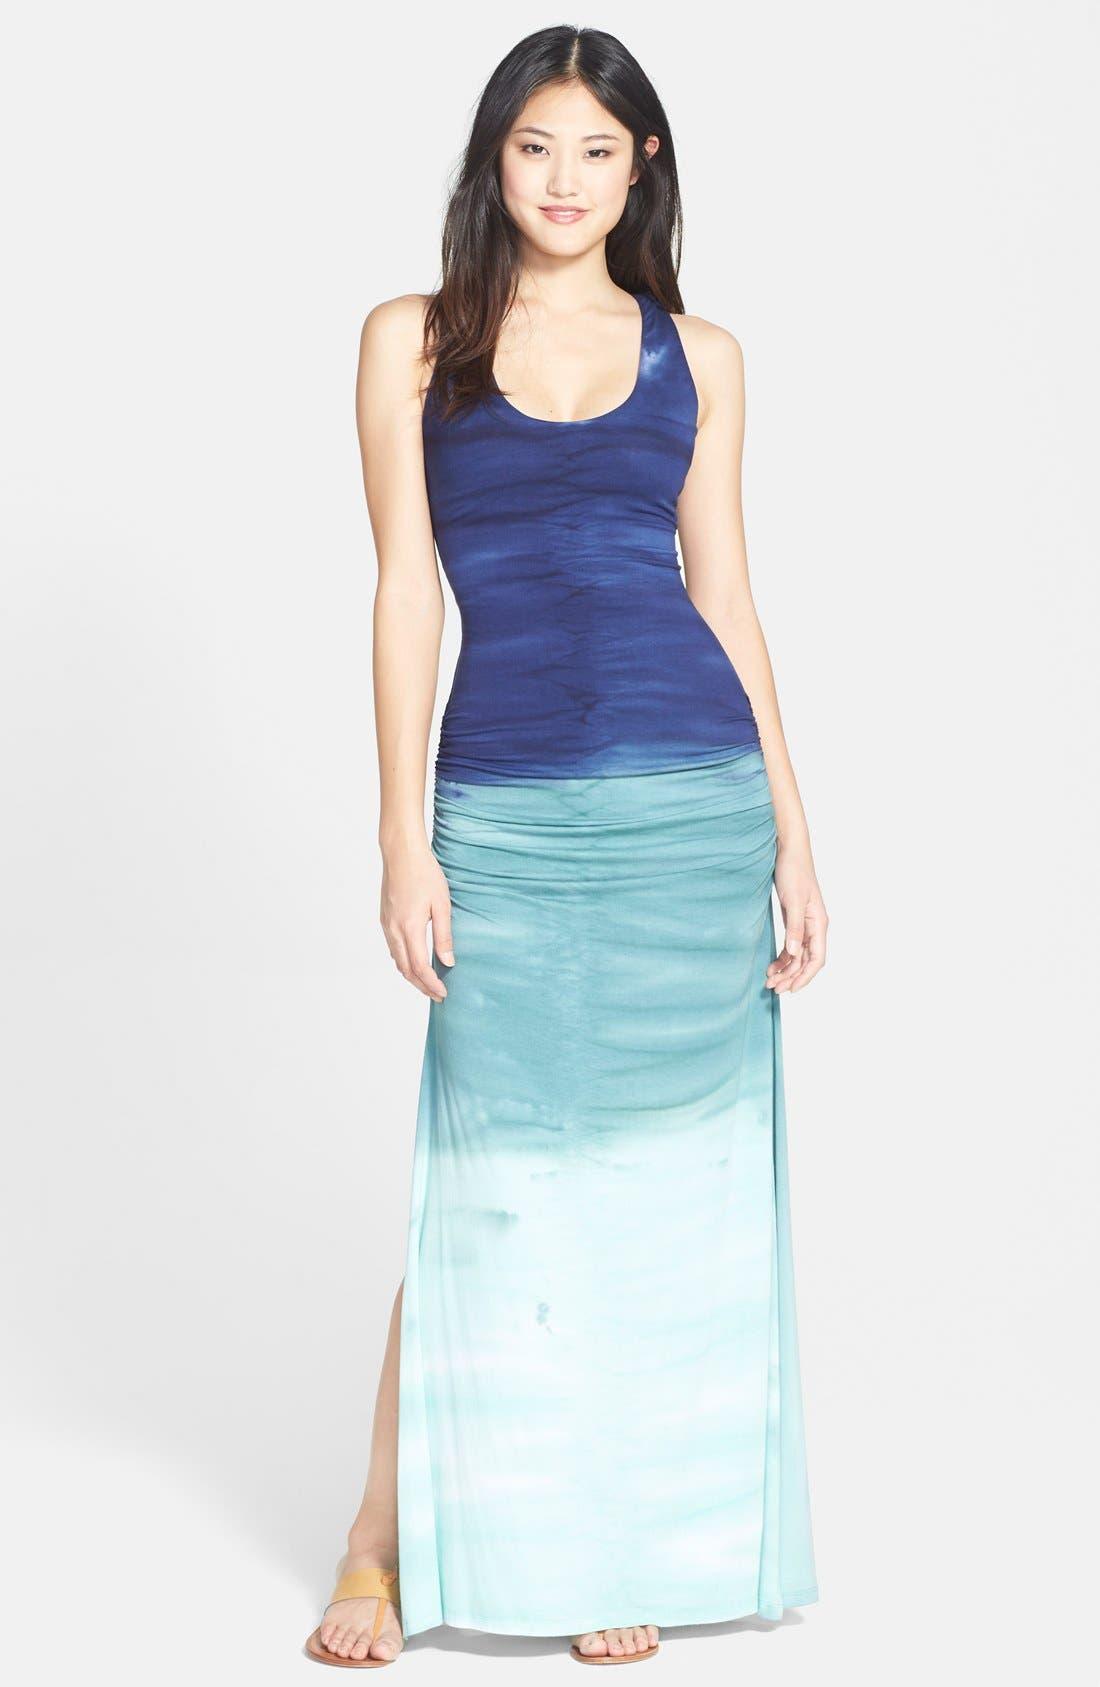 Main Image - Sky Crochet Back Ruched Tie-Dye Maxi Dress